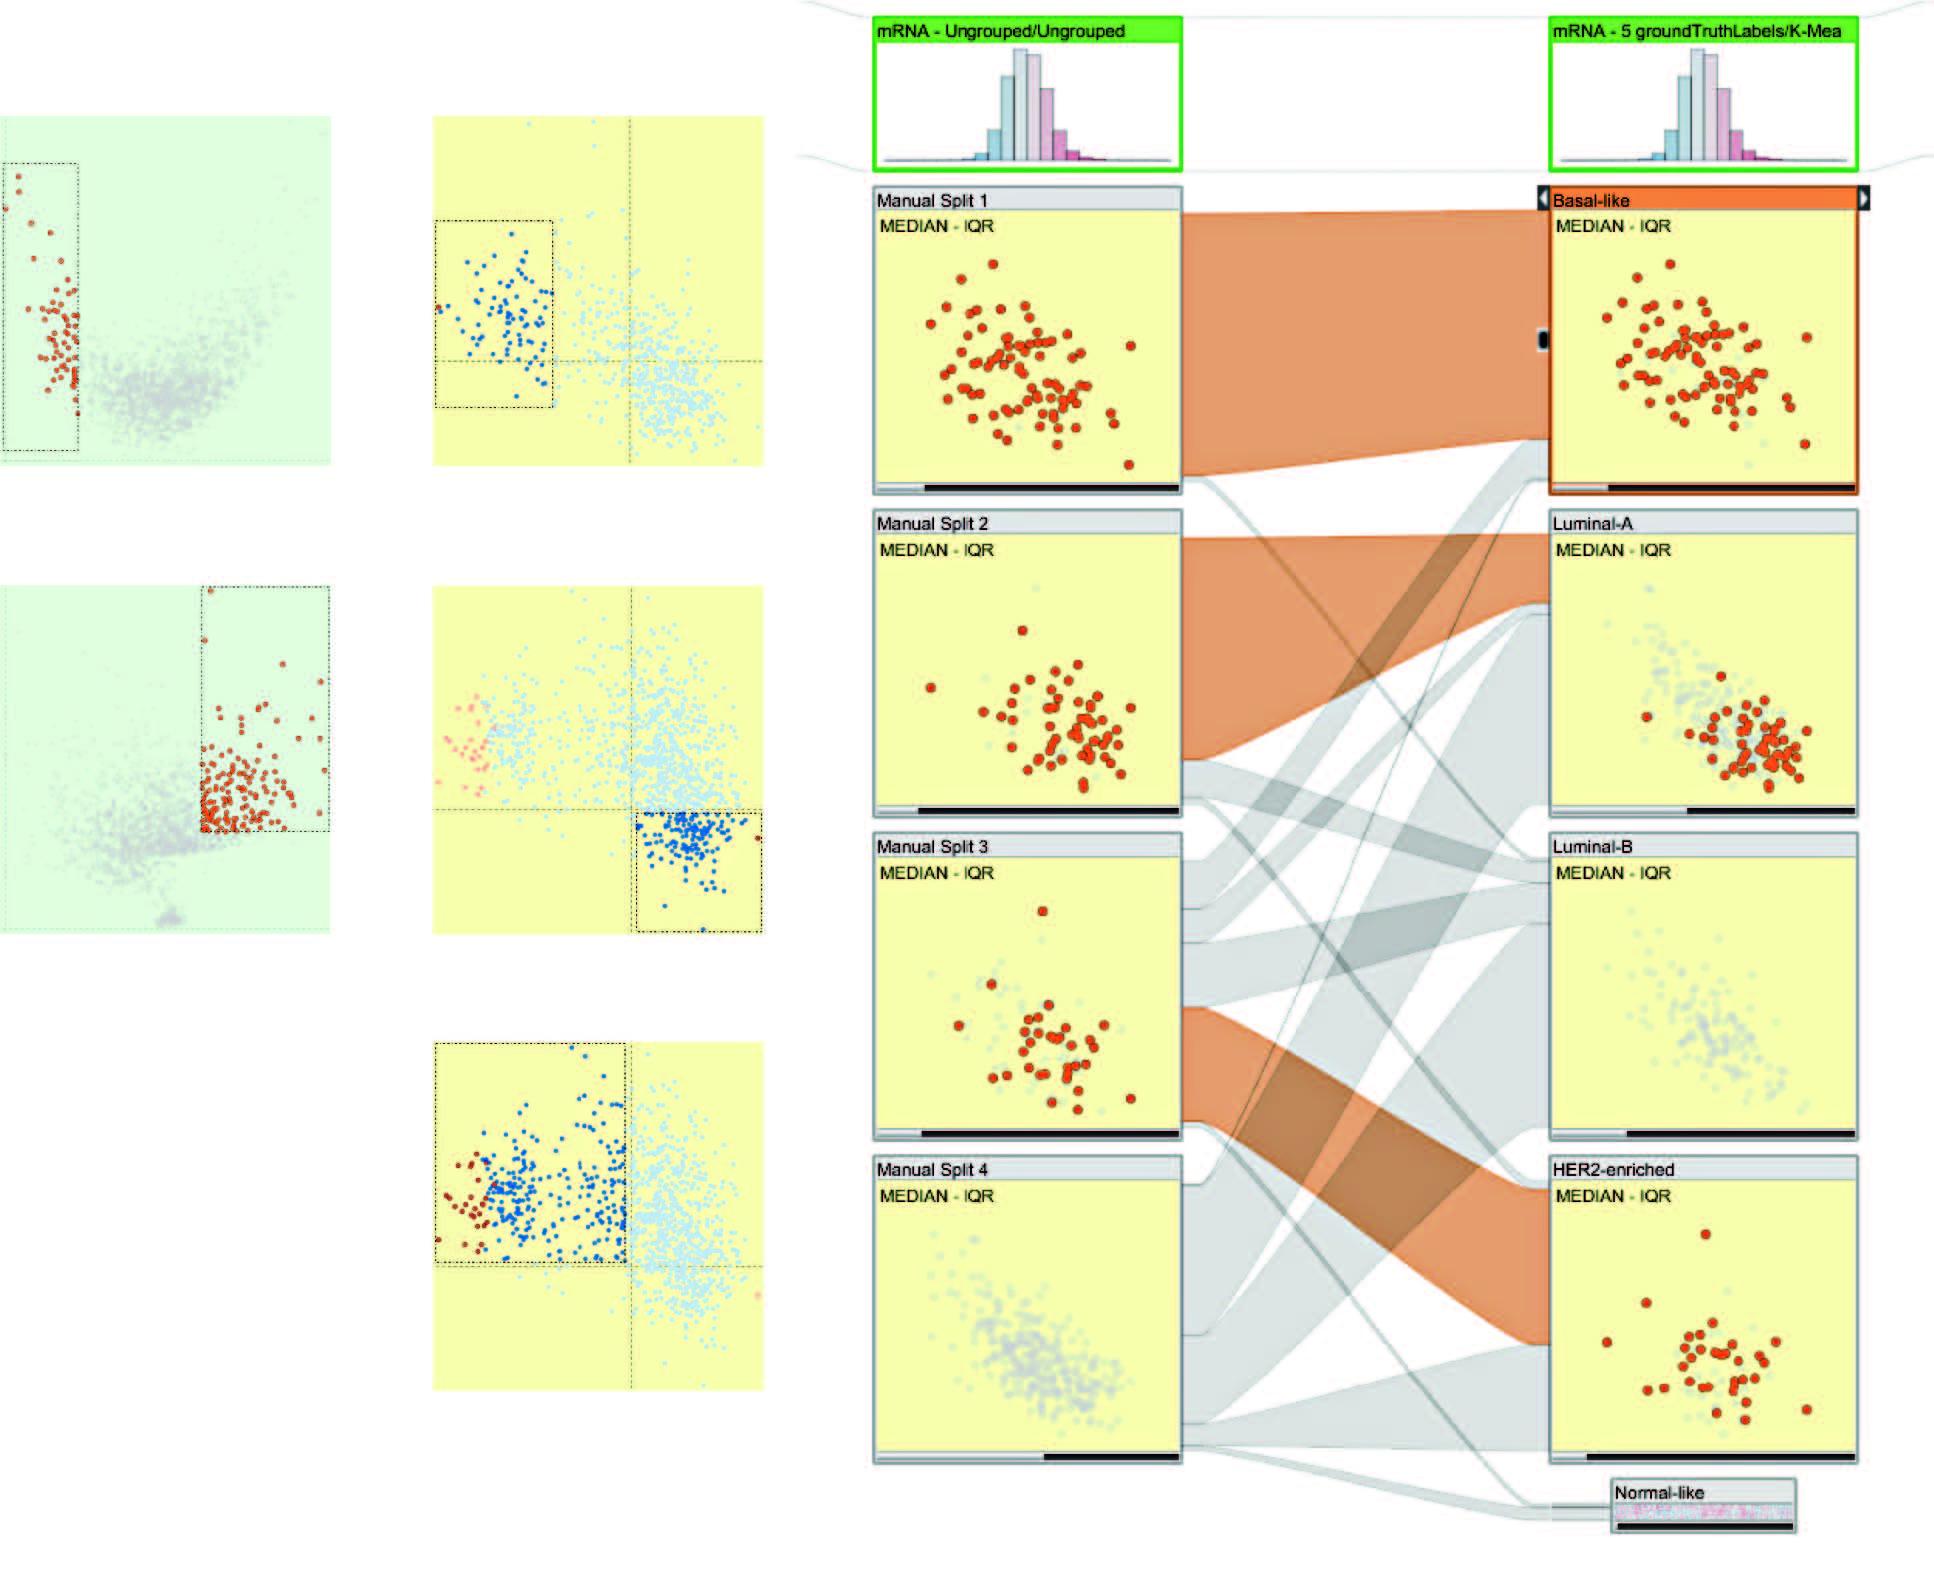 Interactive Visual Analysis